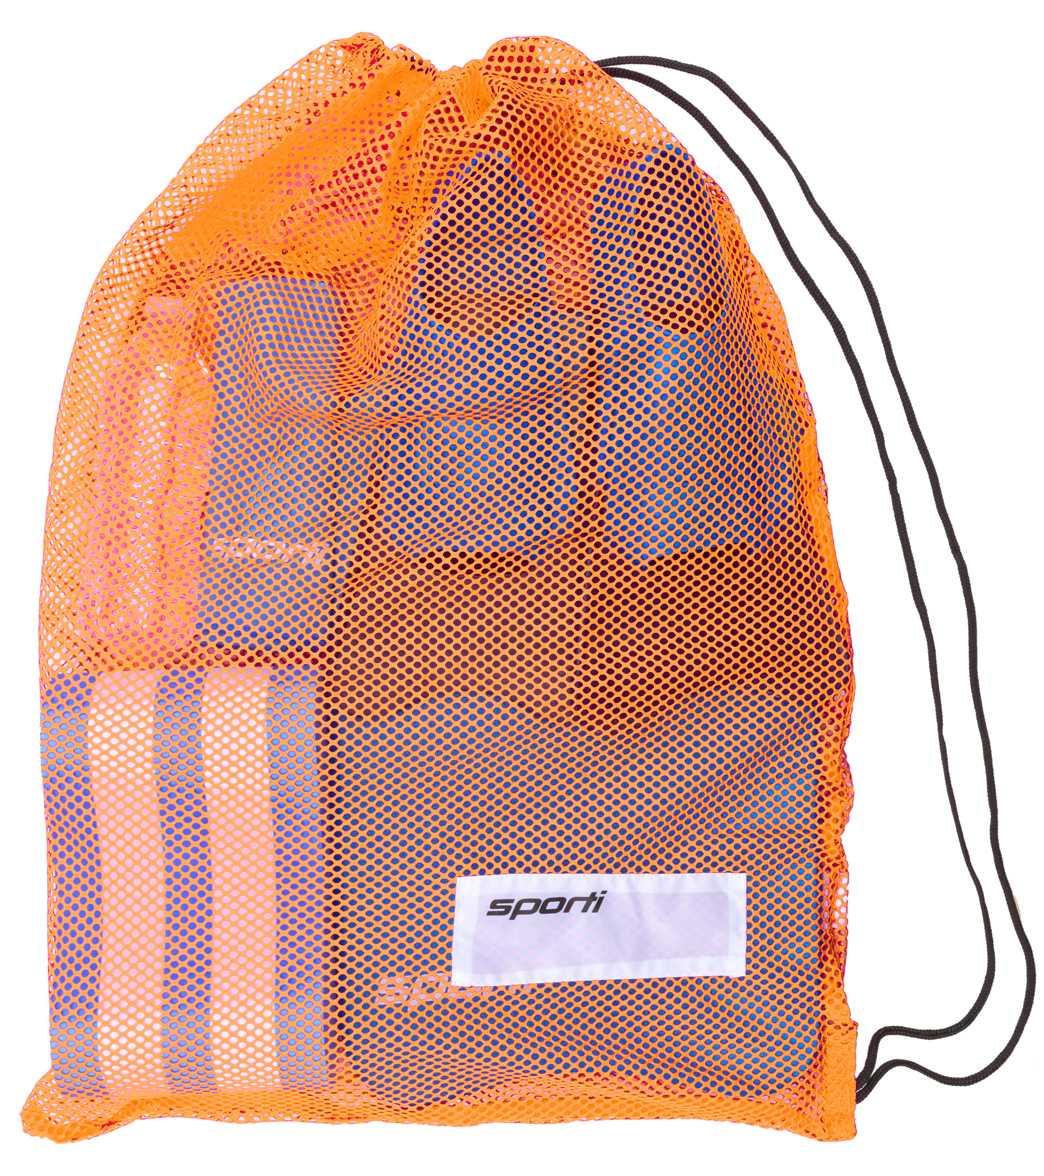 All Star Mesh Backpack- Fenix Toulouse Handball a1126804b34f0